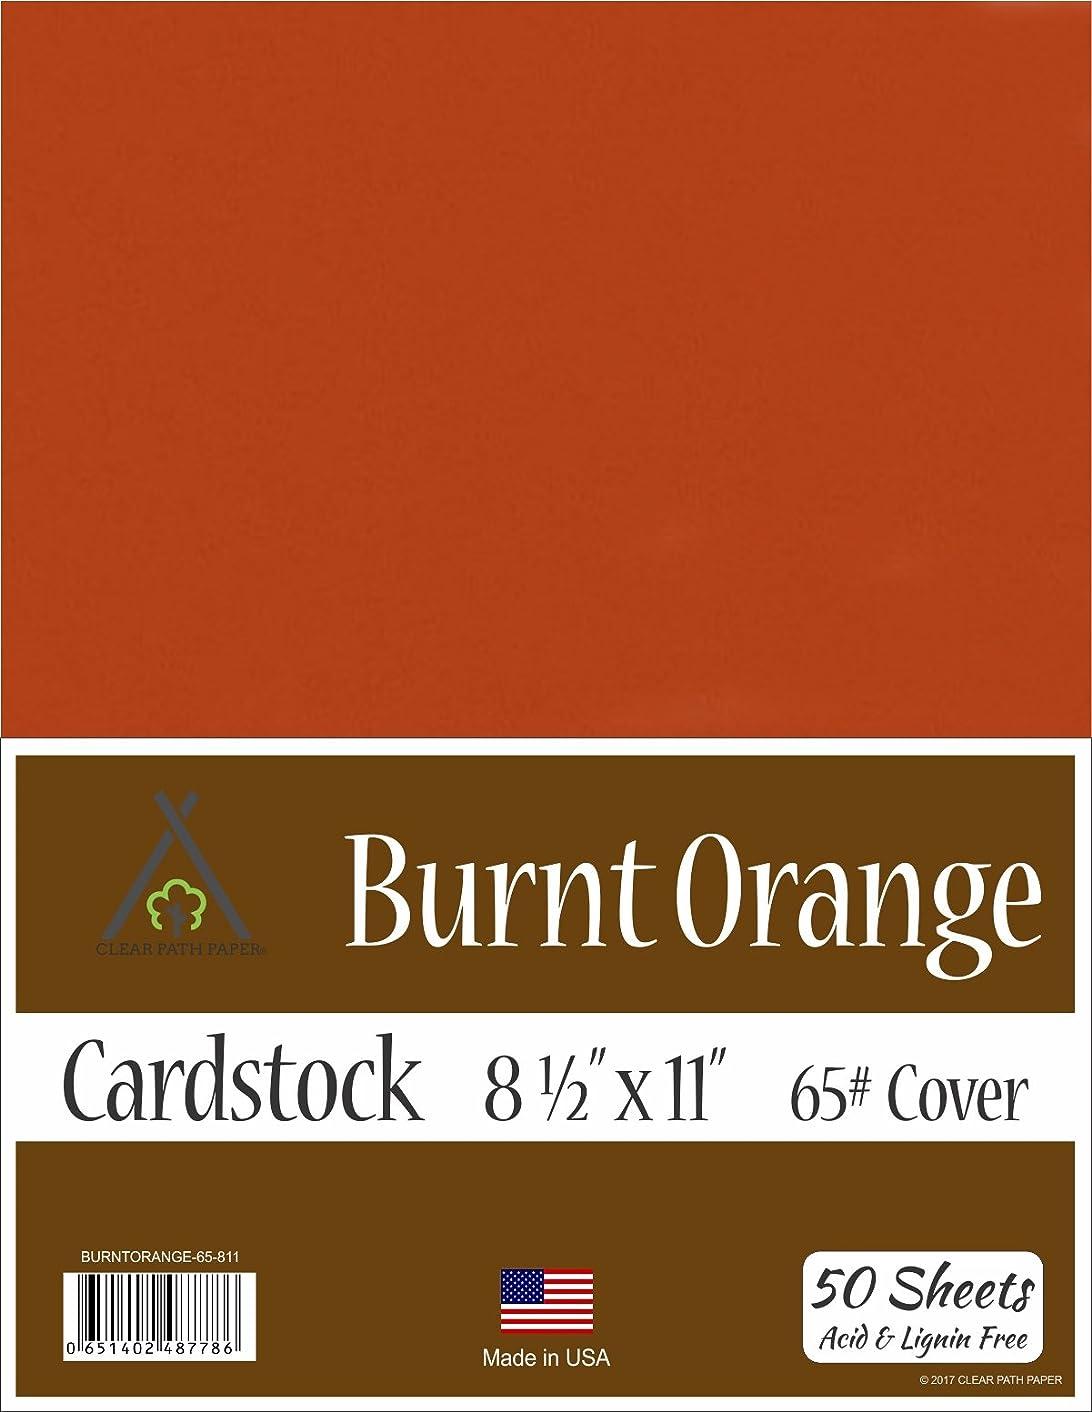 Burnt Orange Cardstock - 8.5 x 11 inch - 65Lb Cover - 50 Sheets